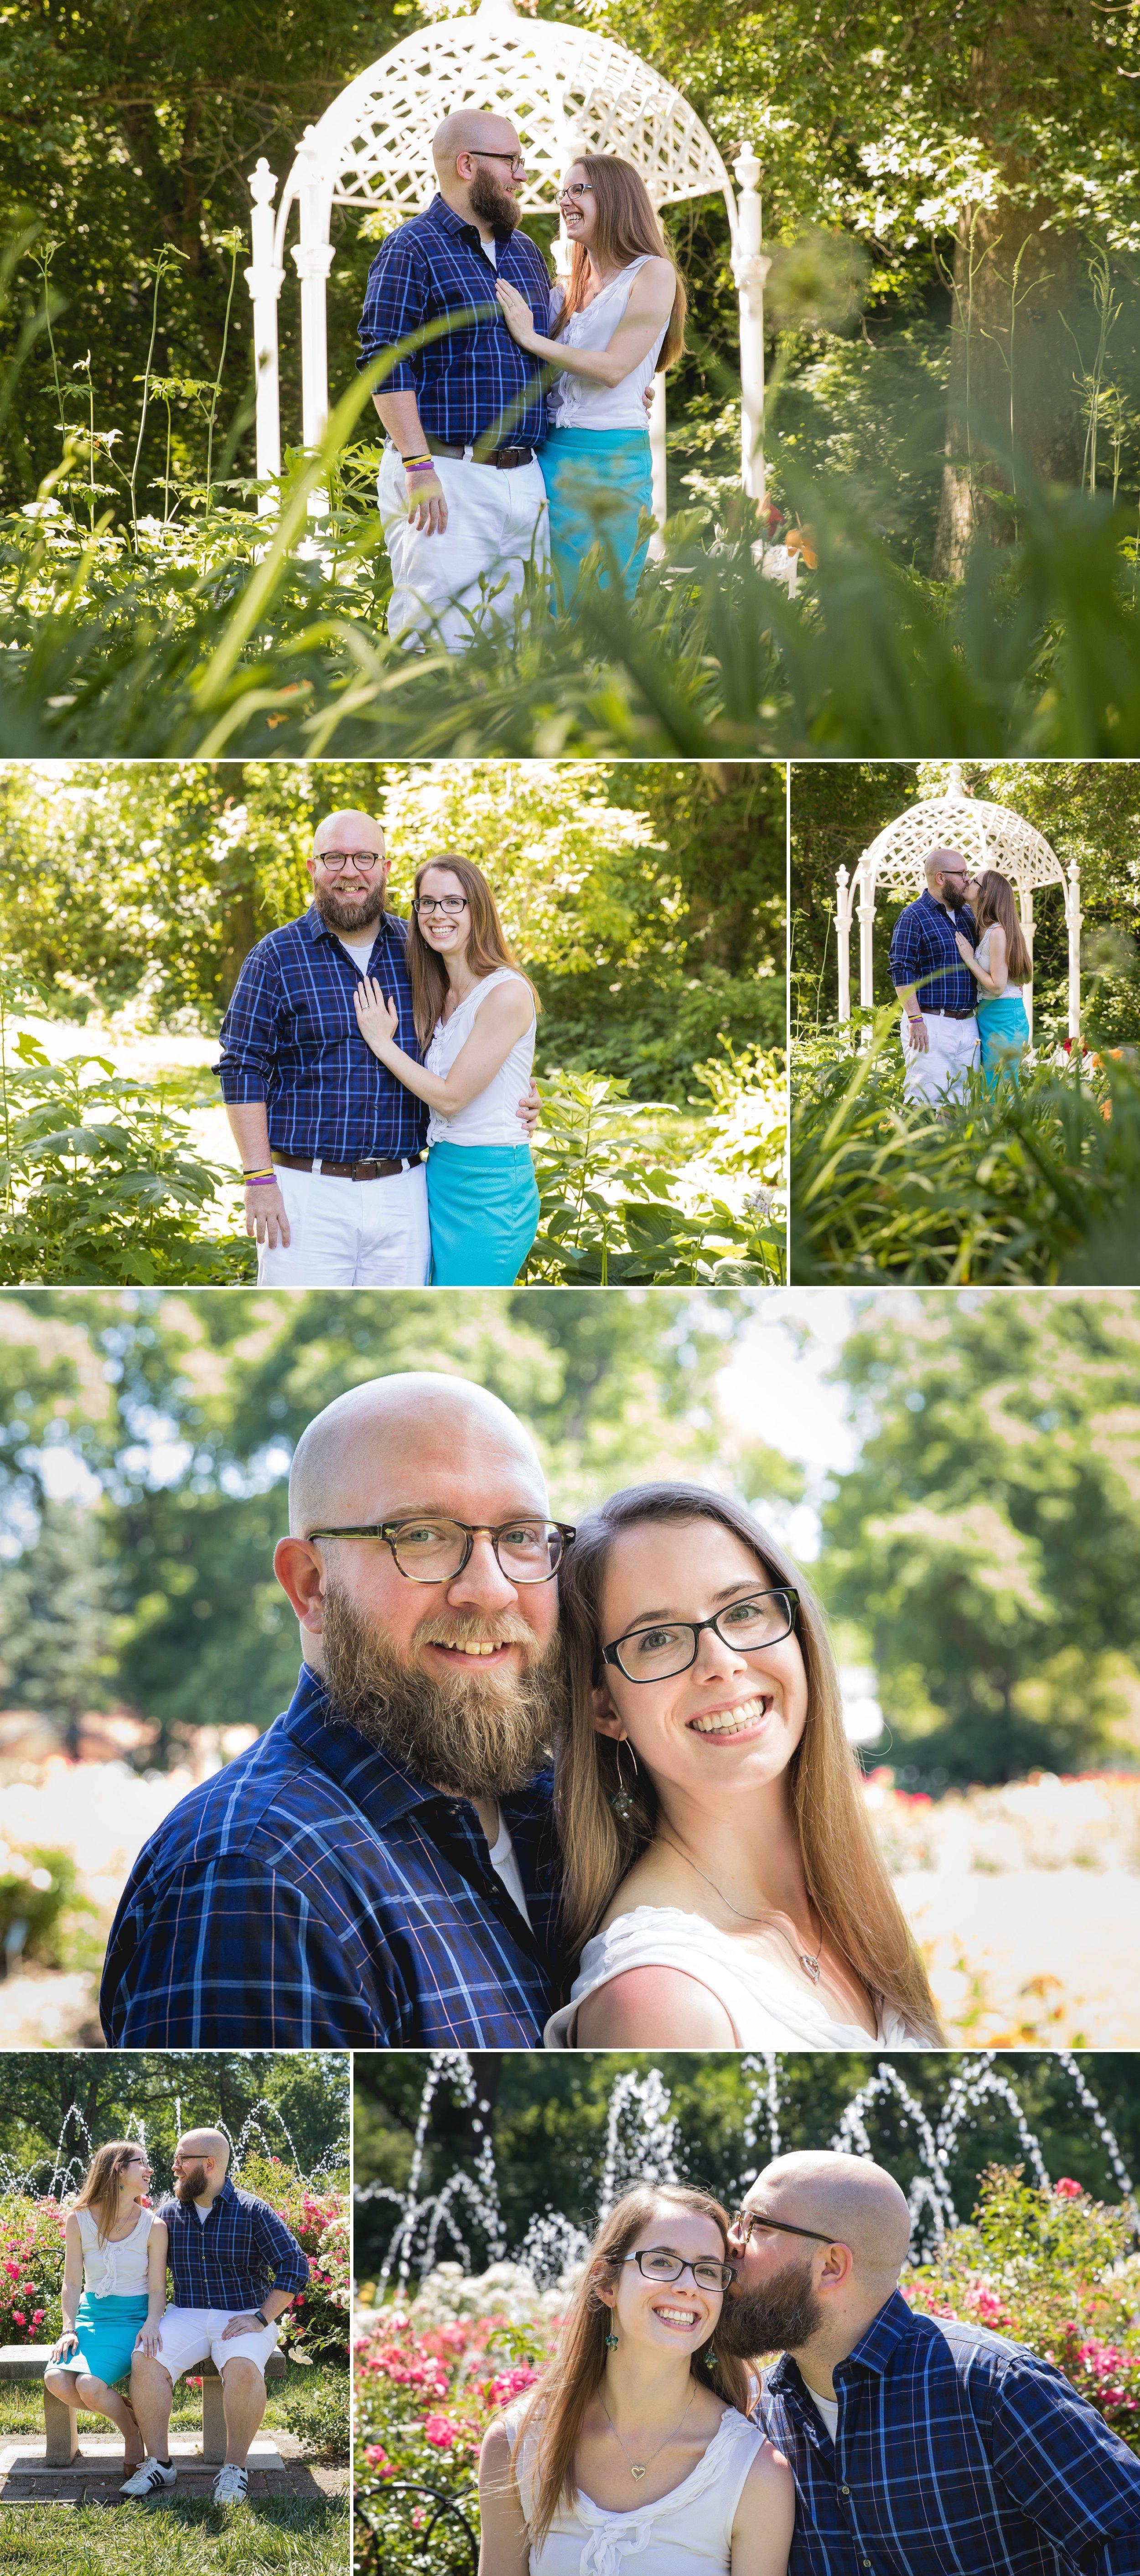 summer-engagement-portrait-session-park-of-roses-clintonville-columbus-ohio-muschlitz-photography-001.JPG